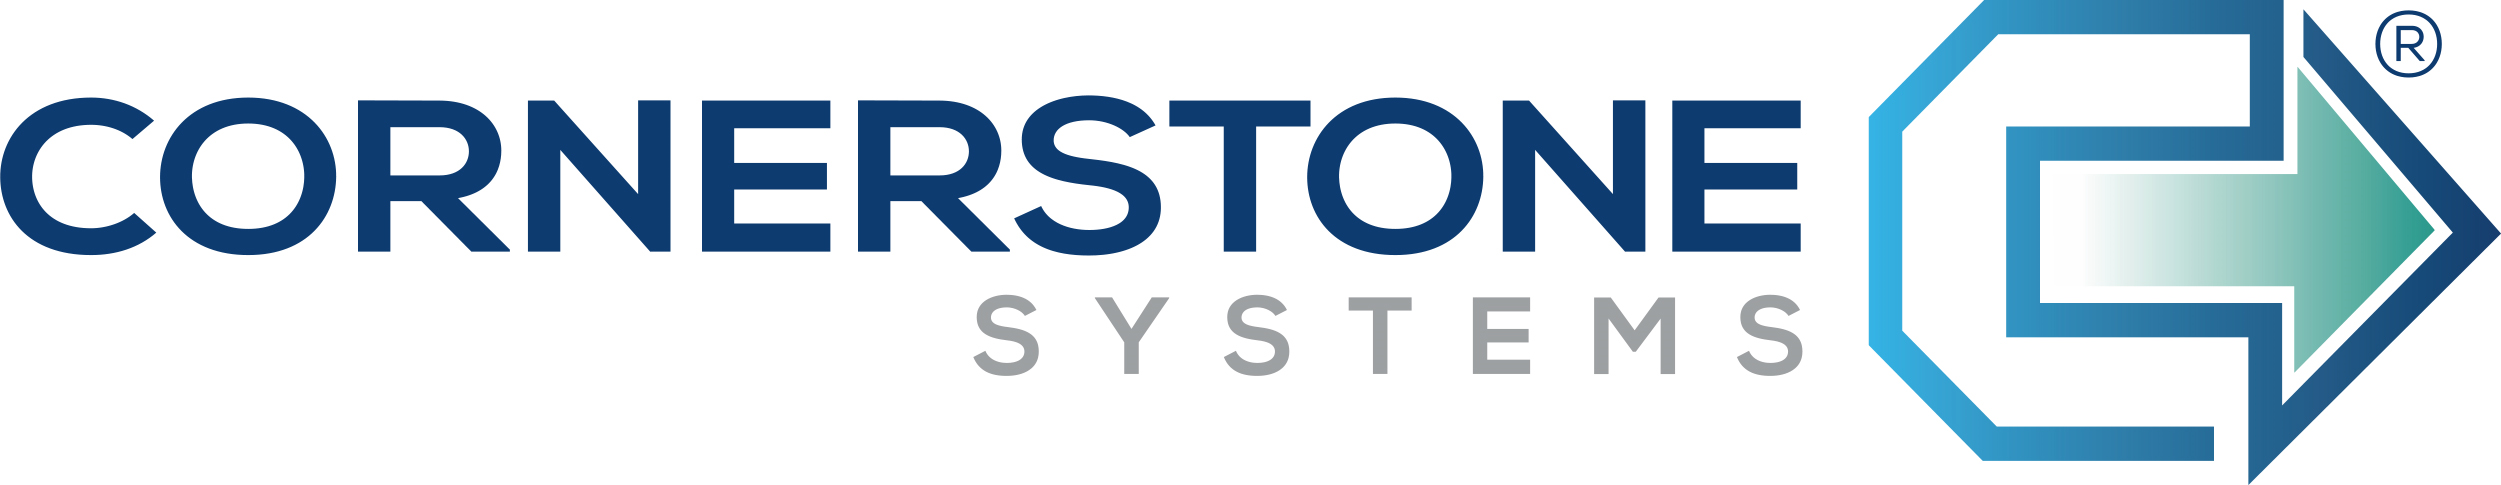 Cornerstone Systems Inc logo